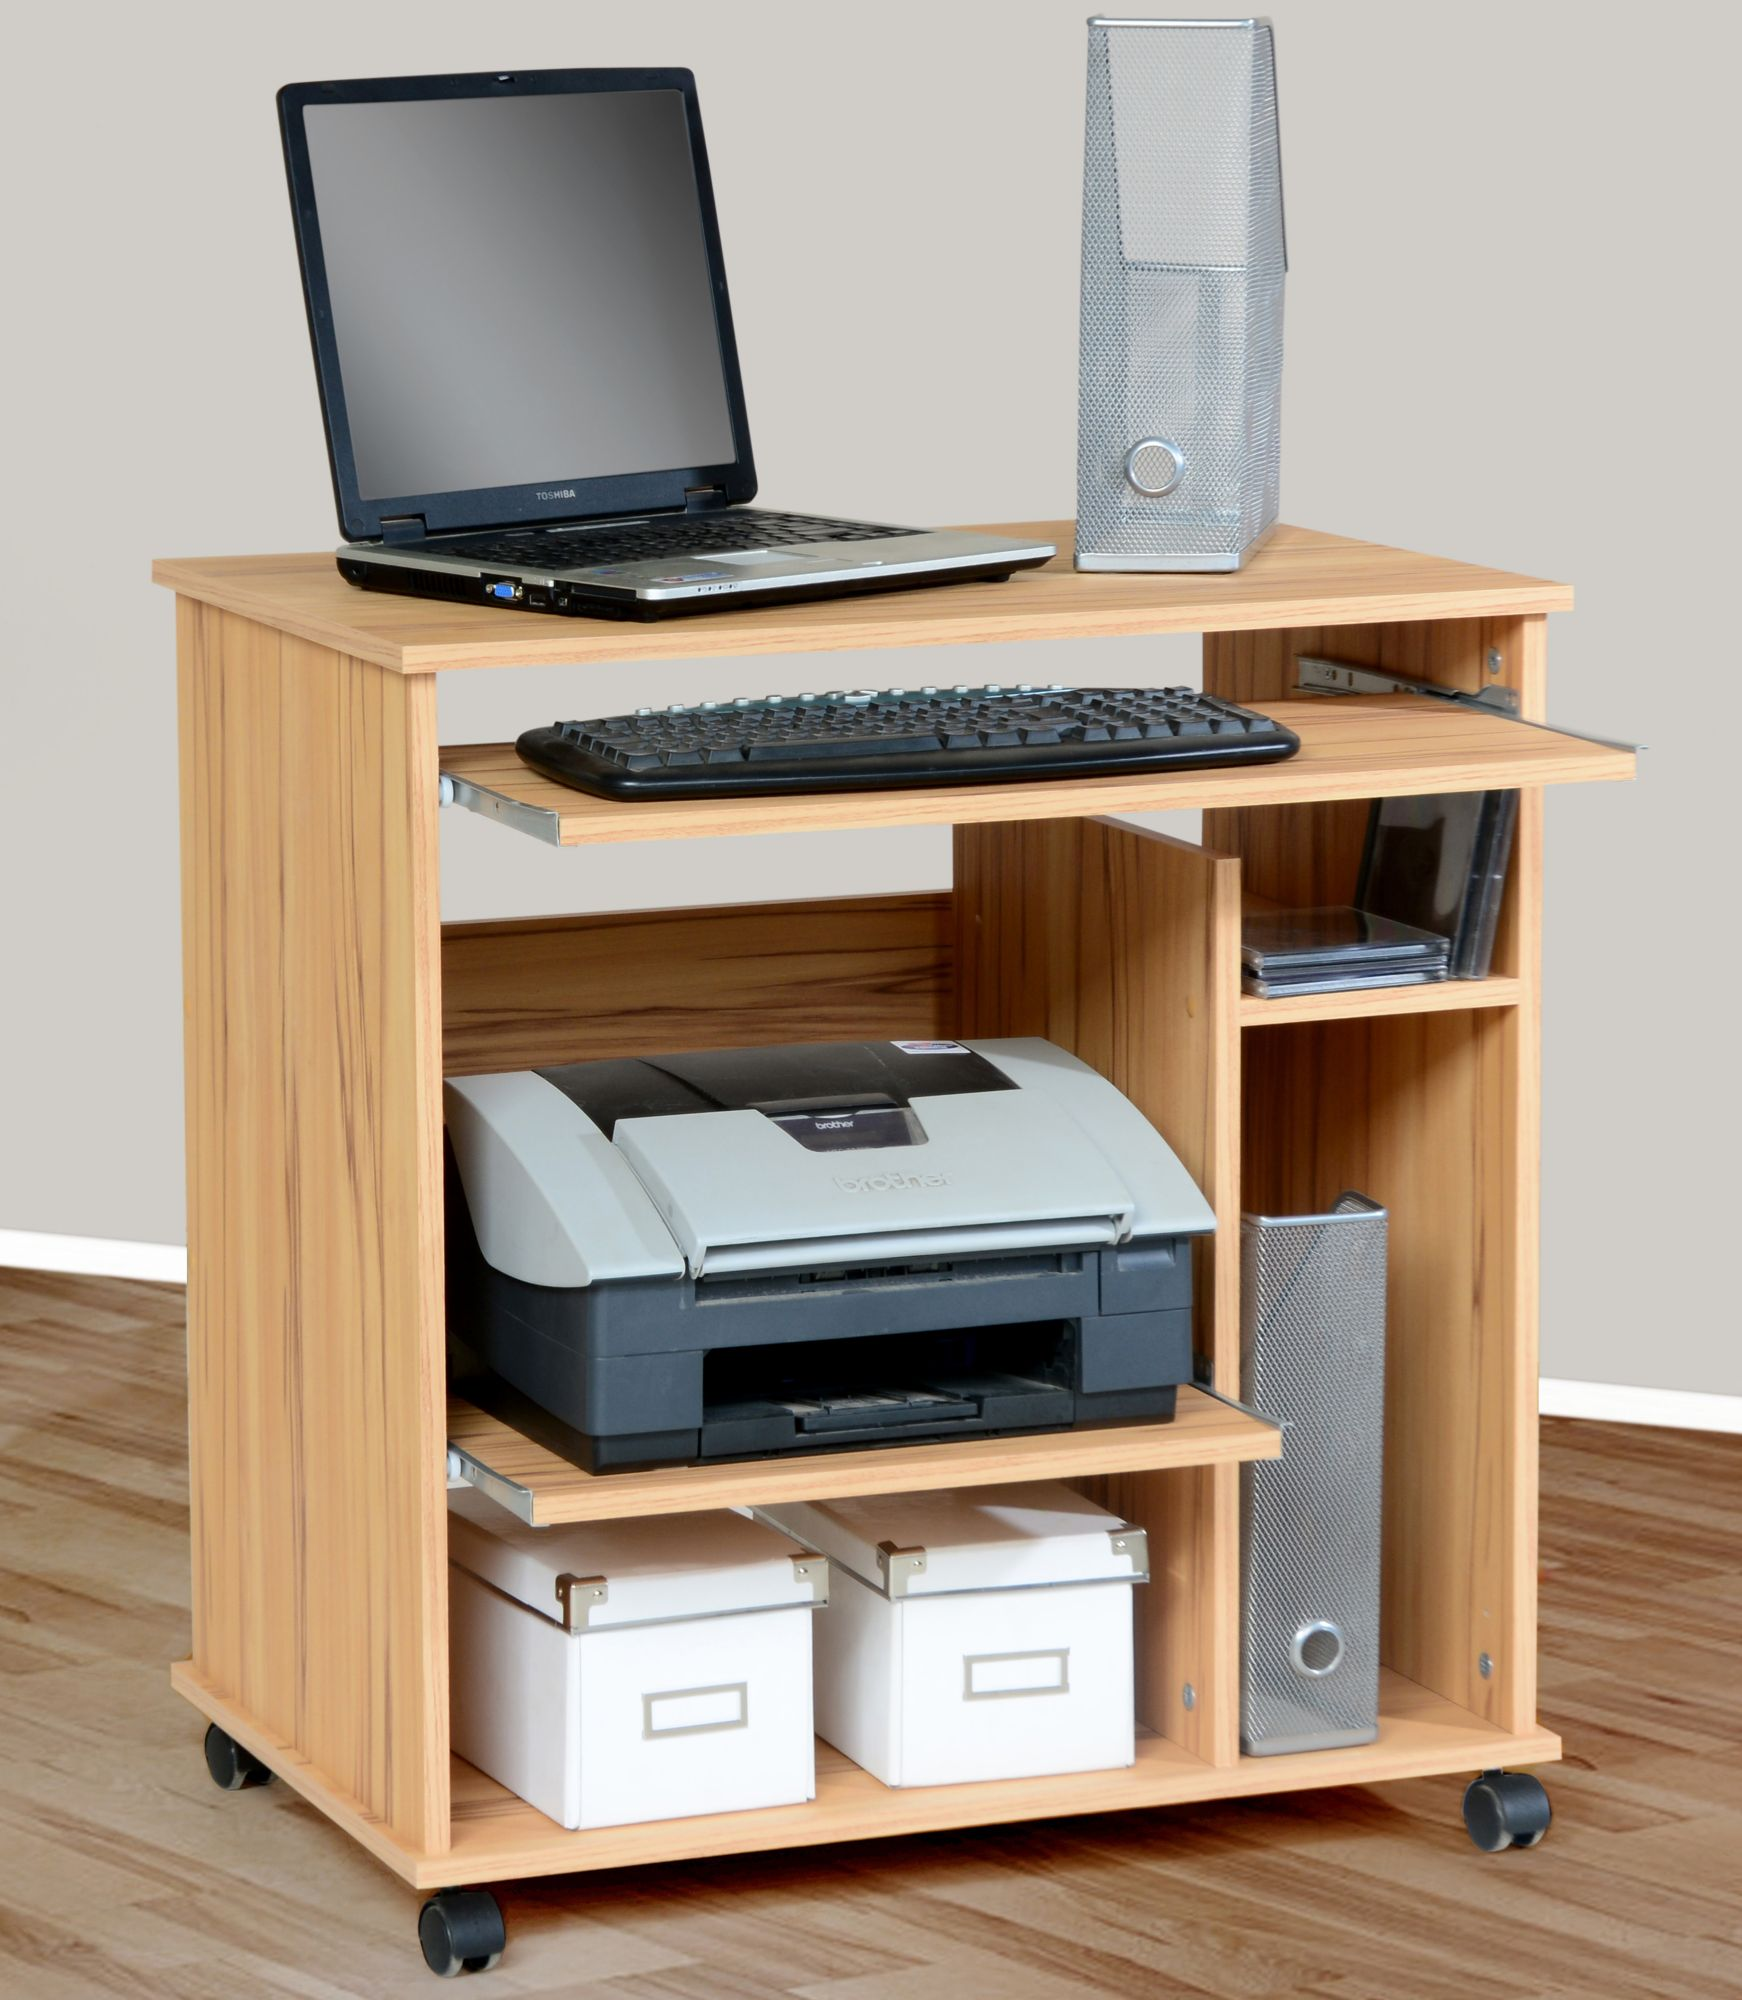 schreibtisch compi schwab versand computertische. Black Bedroom Furniture Sets. Home Design Ideas